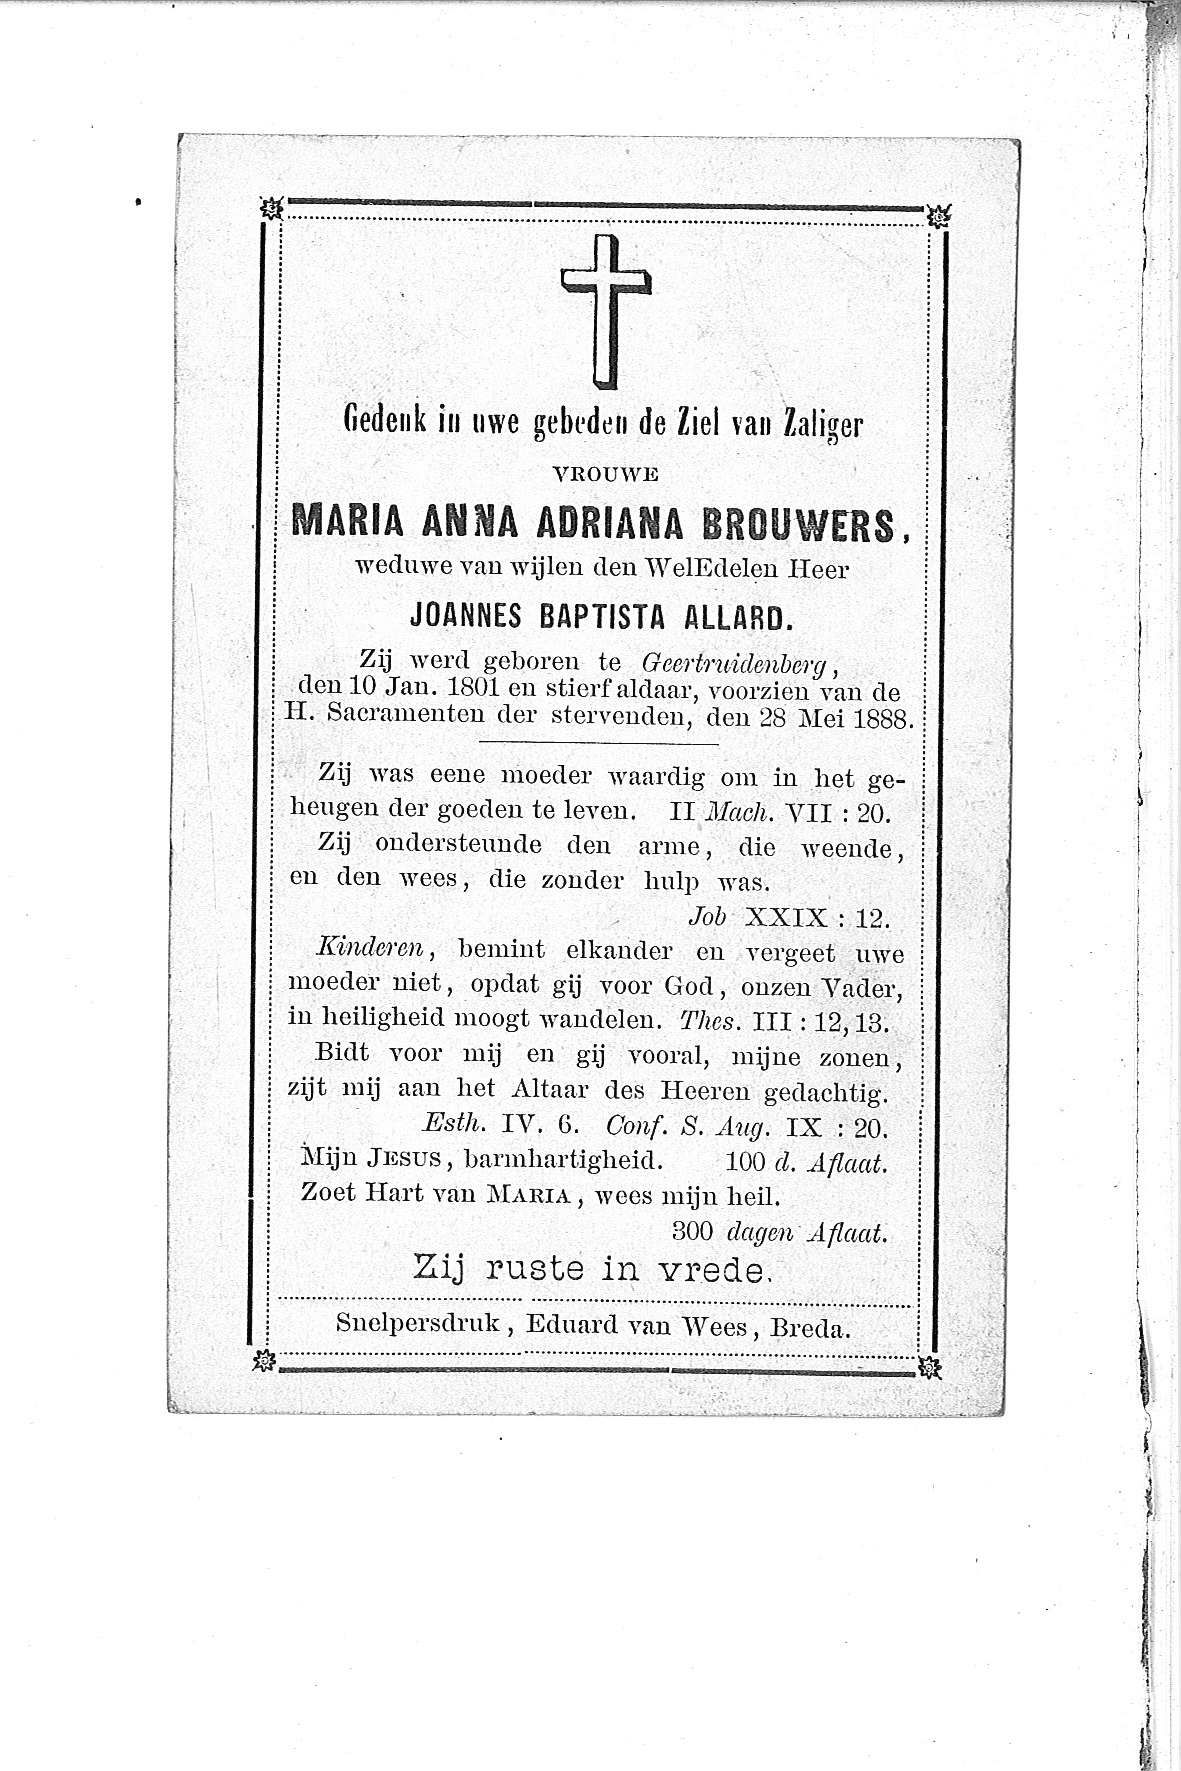 Maria Anna Adriana (1888) 20110805165022_00097.jpg